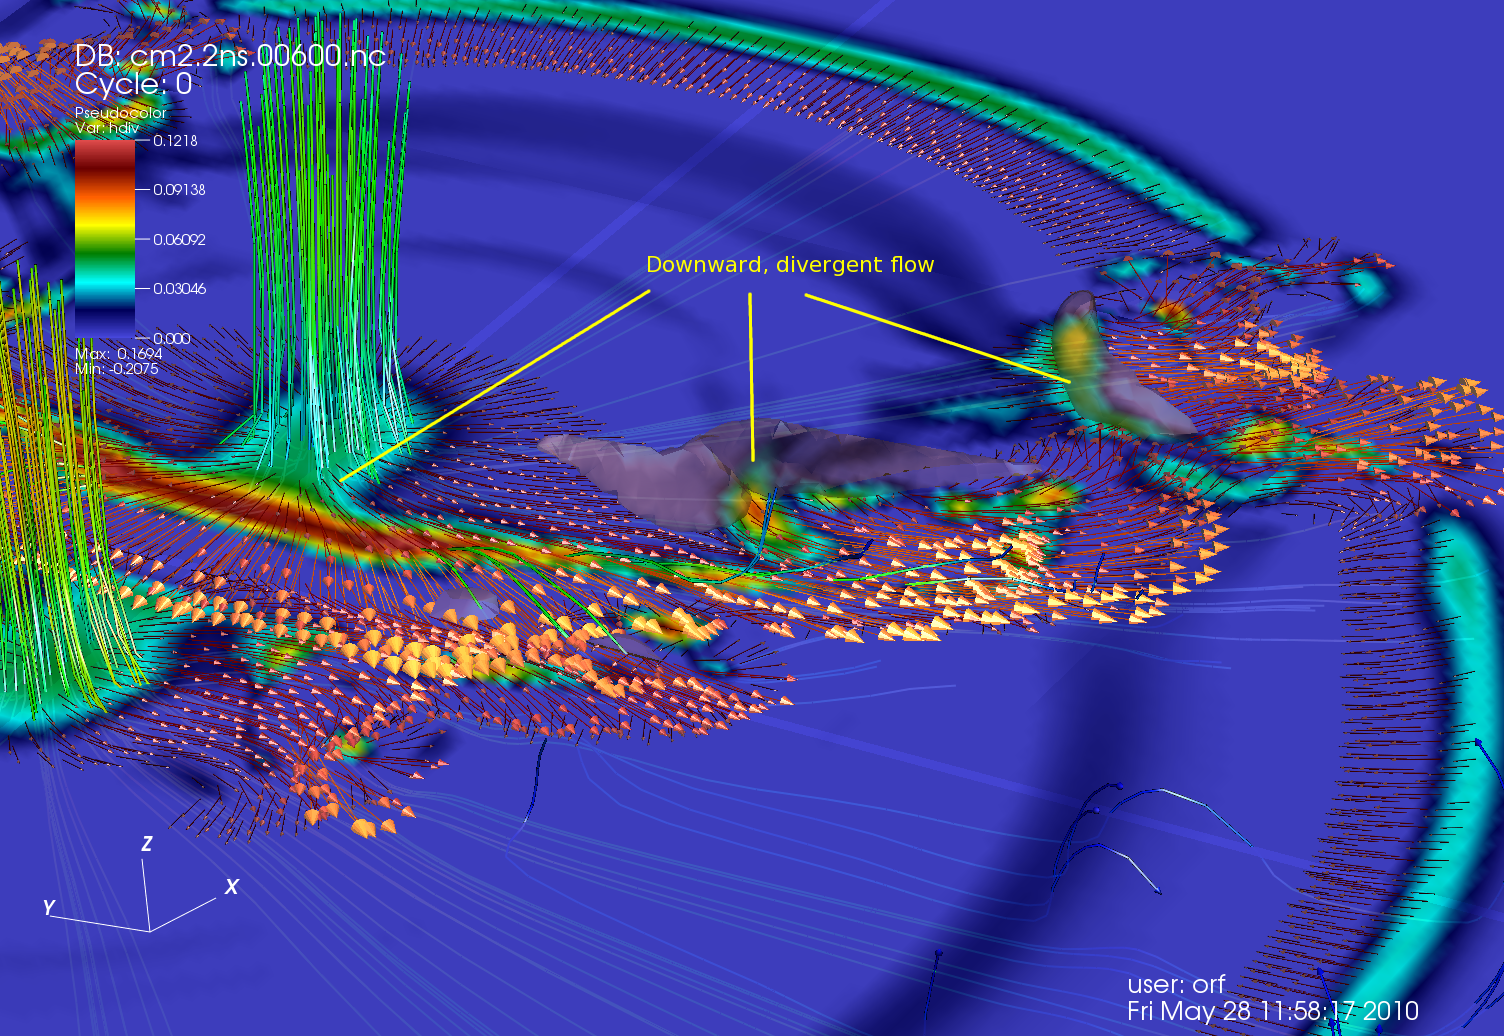 Colliding microburst simulation